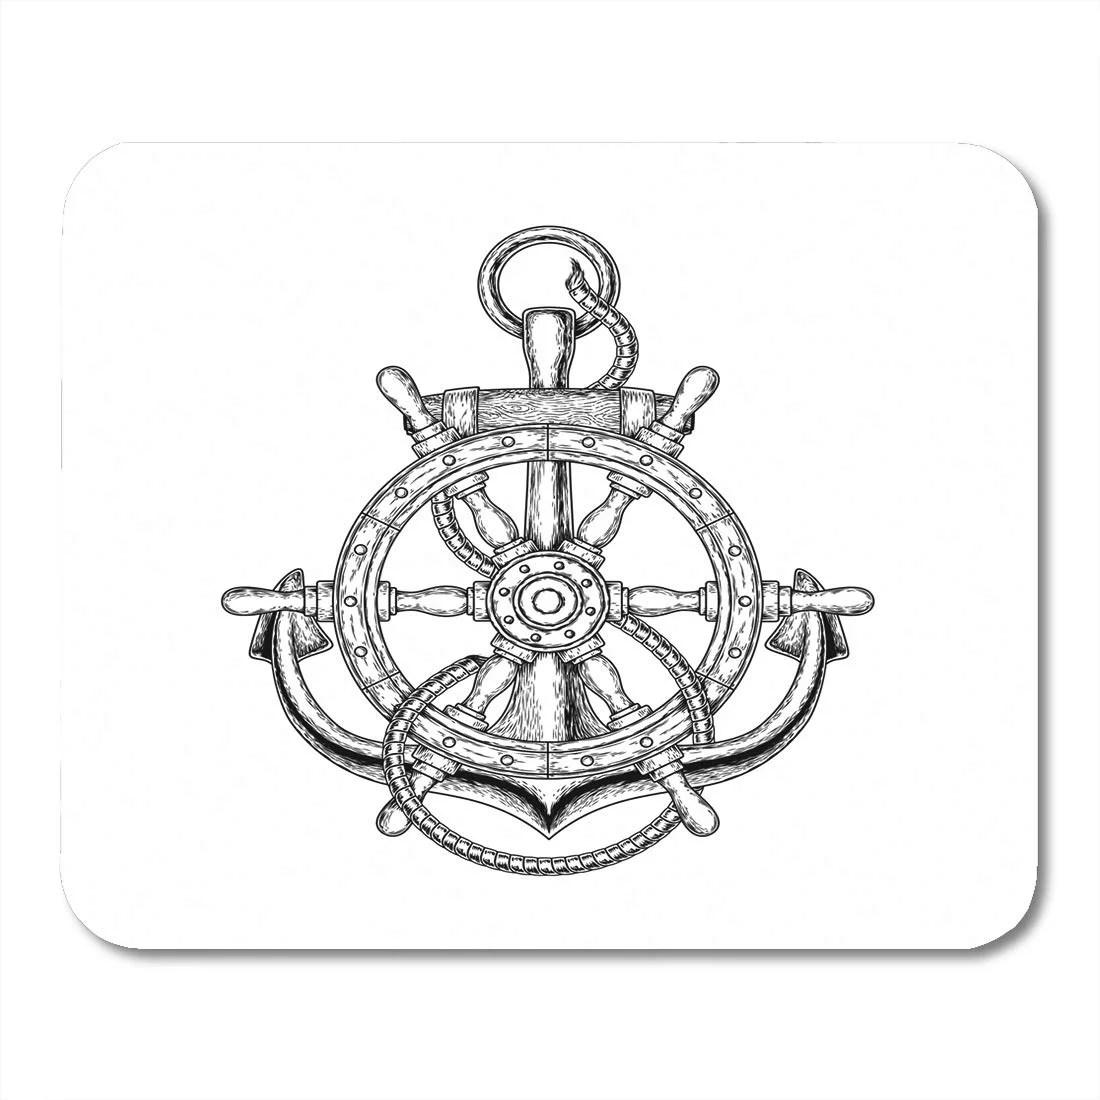 Sidonku Tattoo Of Nautical Steering Wheel And Anchor